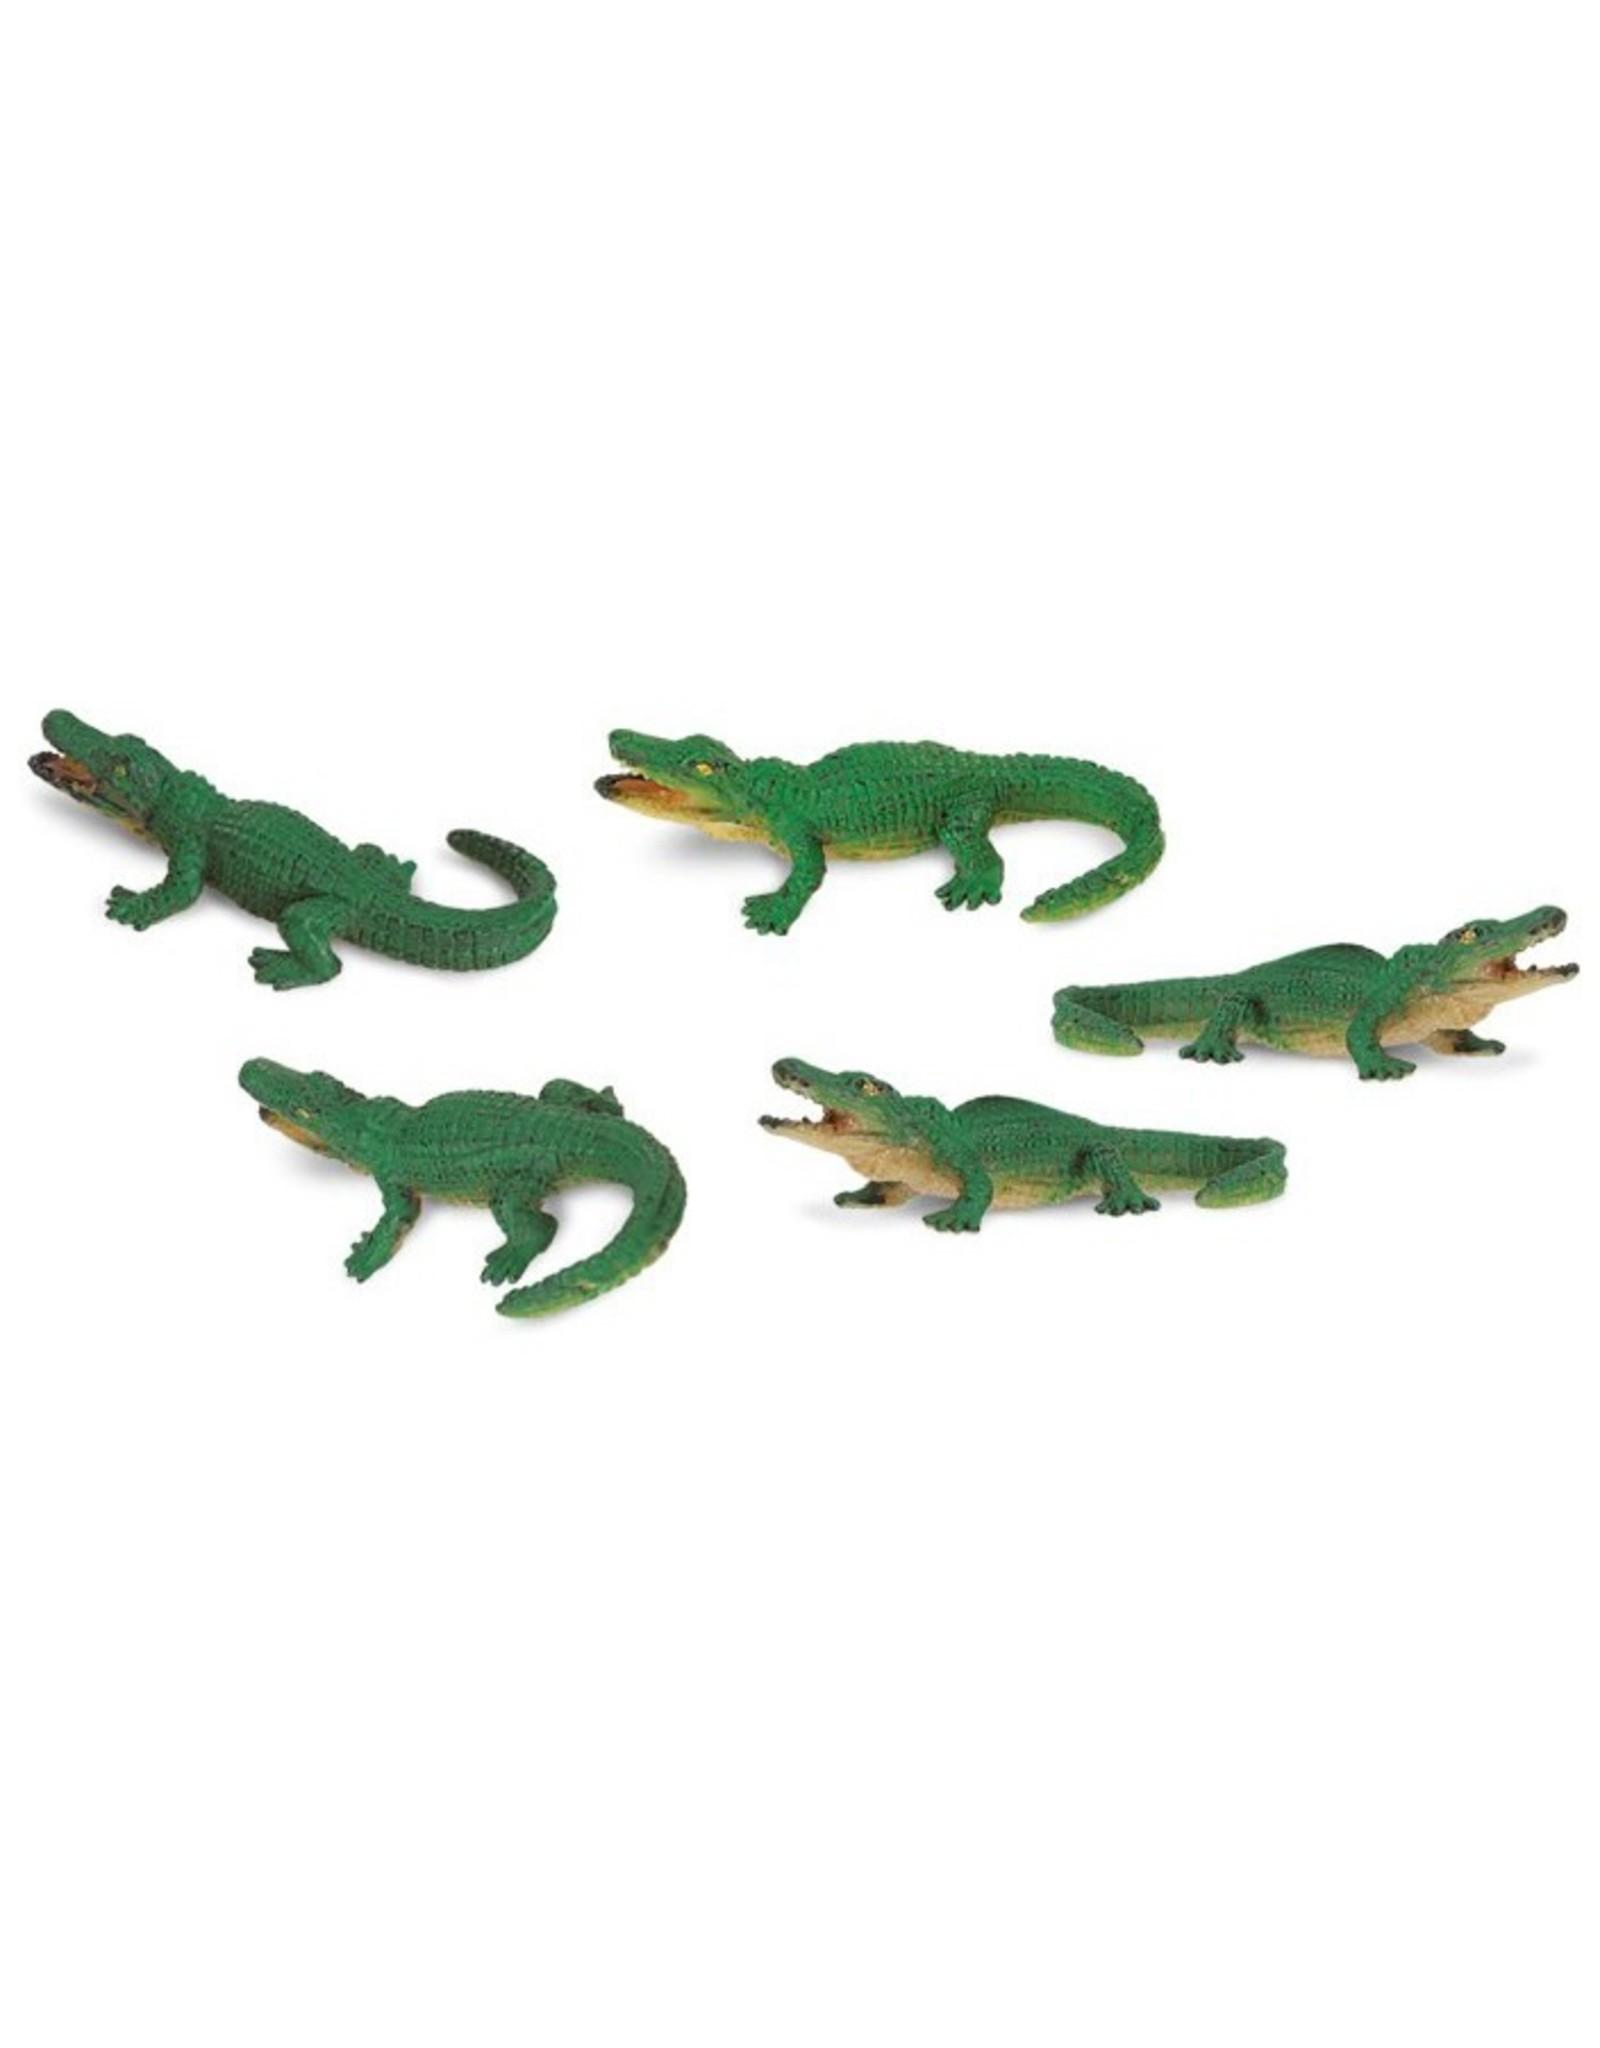 Goodluck mini - krokodillen